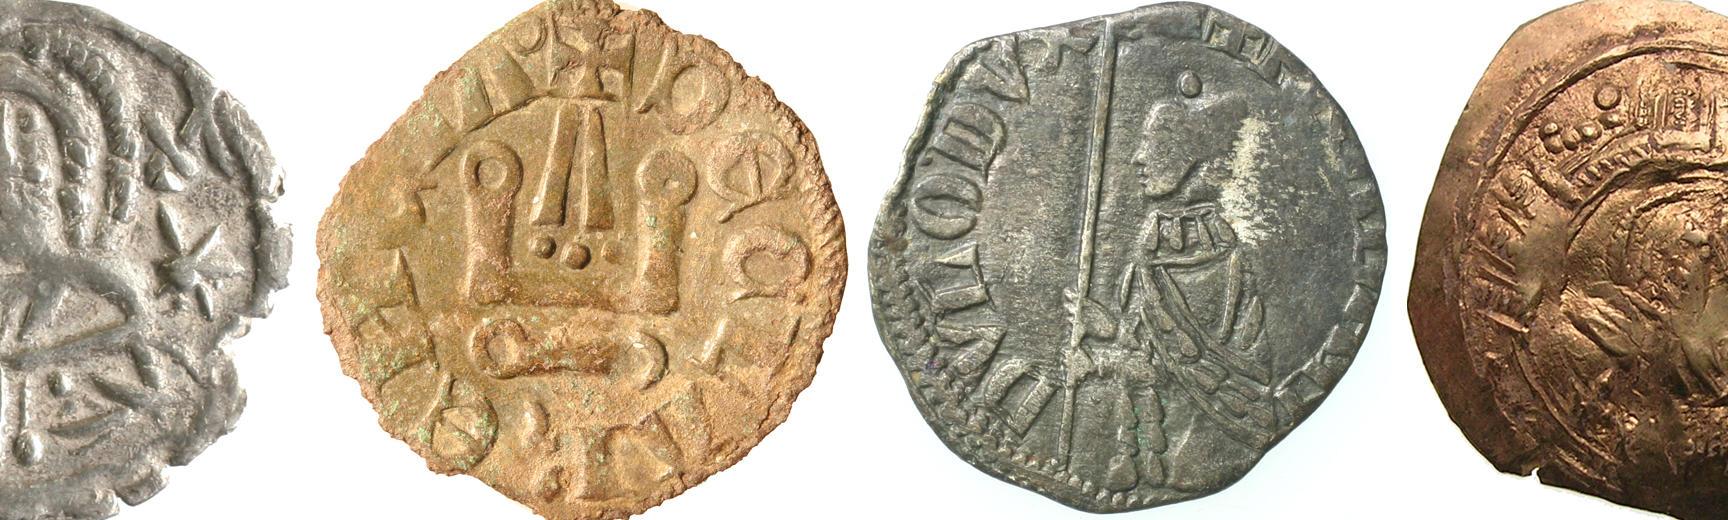 Money in 14th century Constantinople